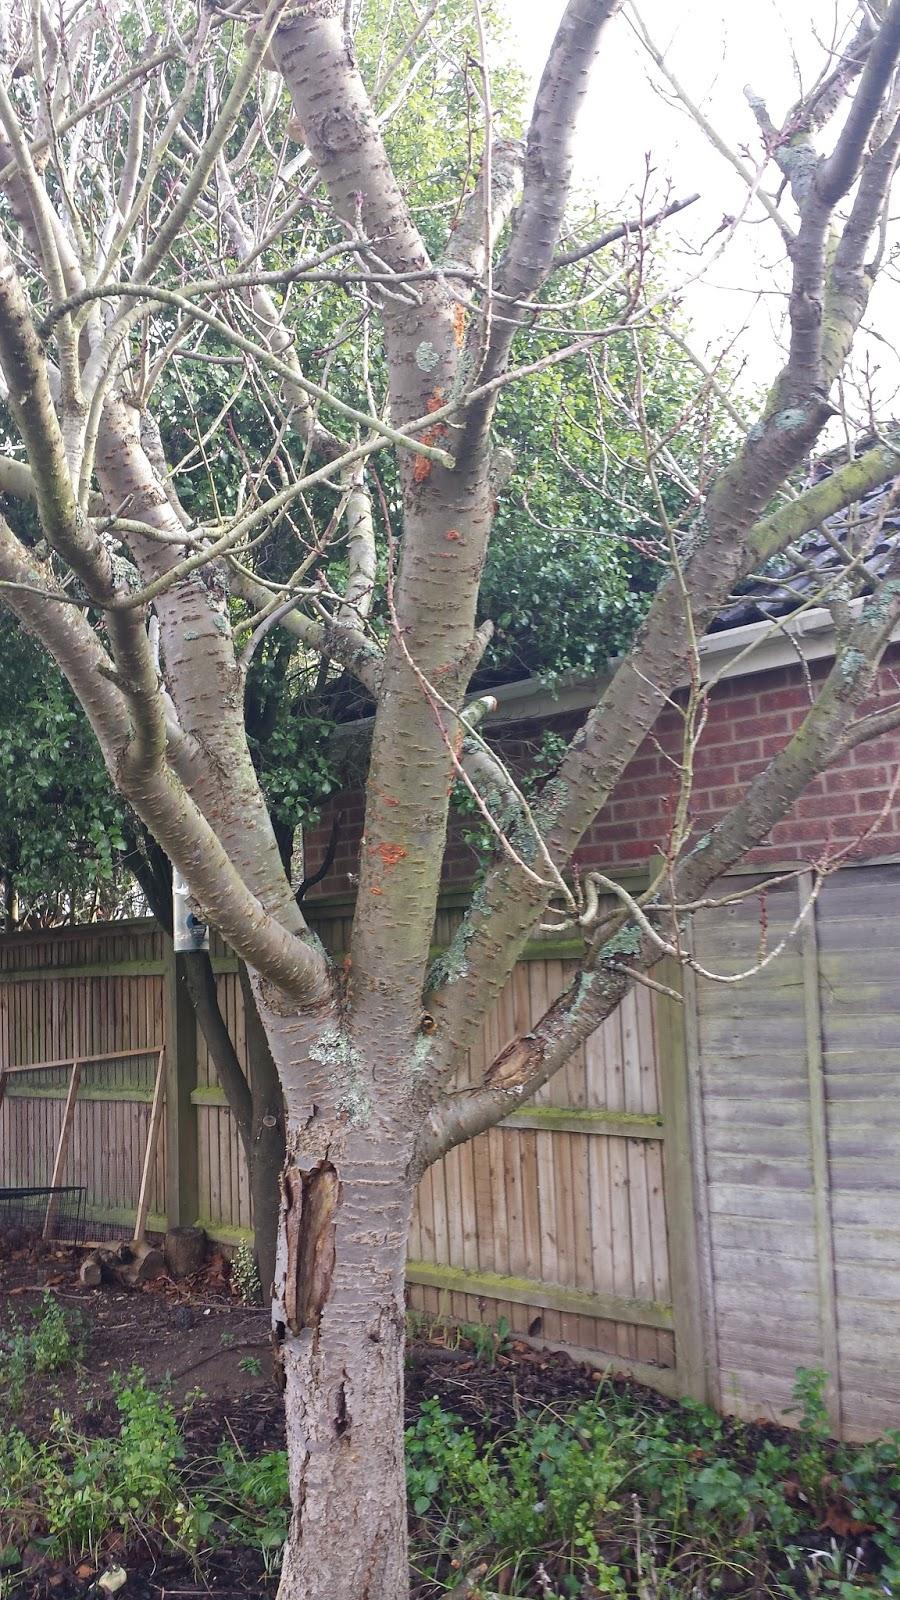 Rachel The Gardener Cherry Tree With Damaged Bark